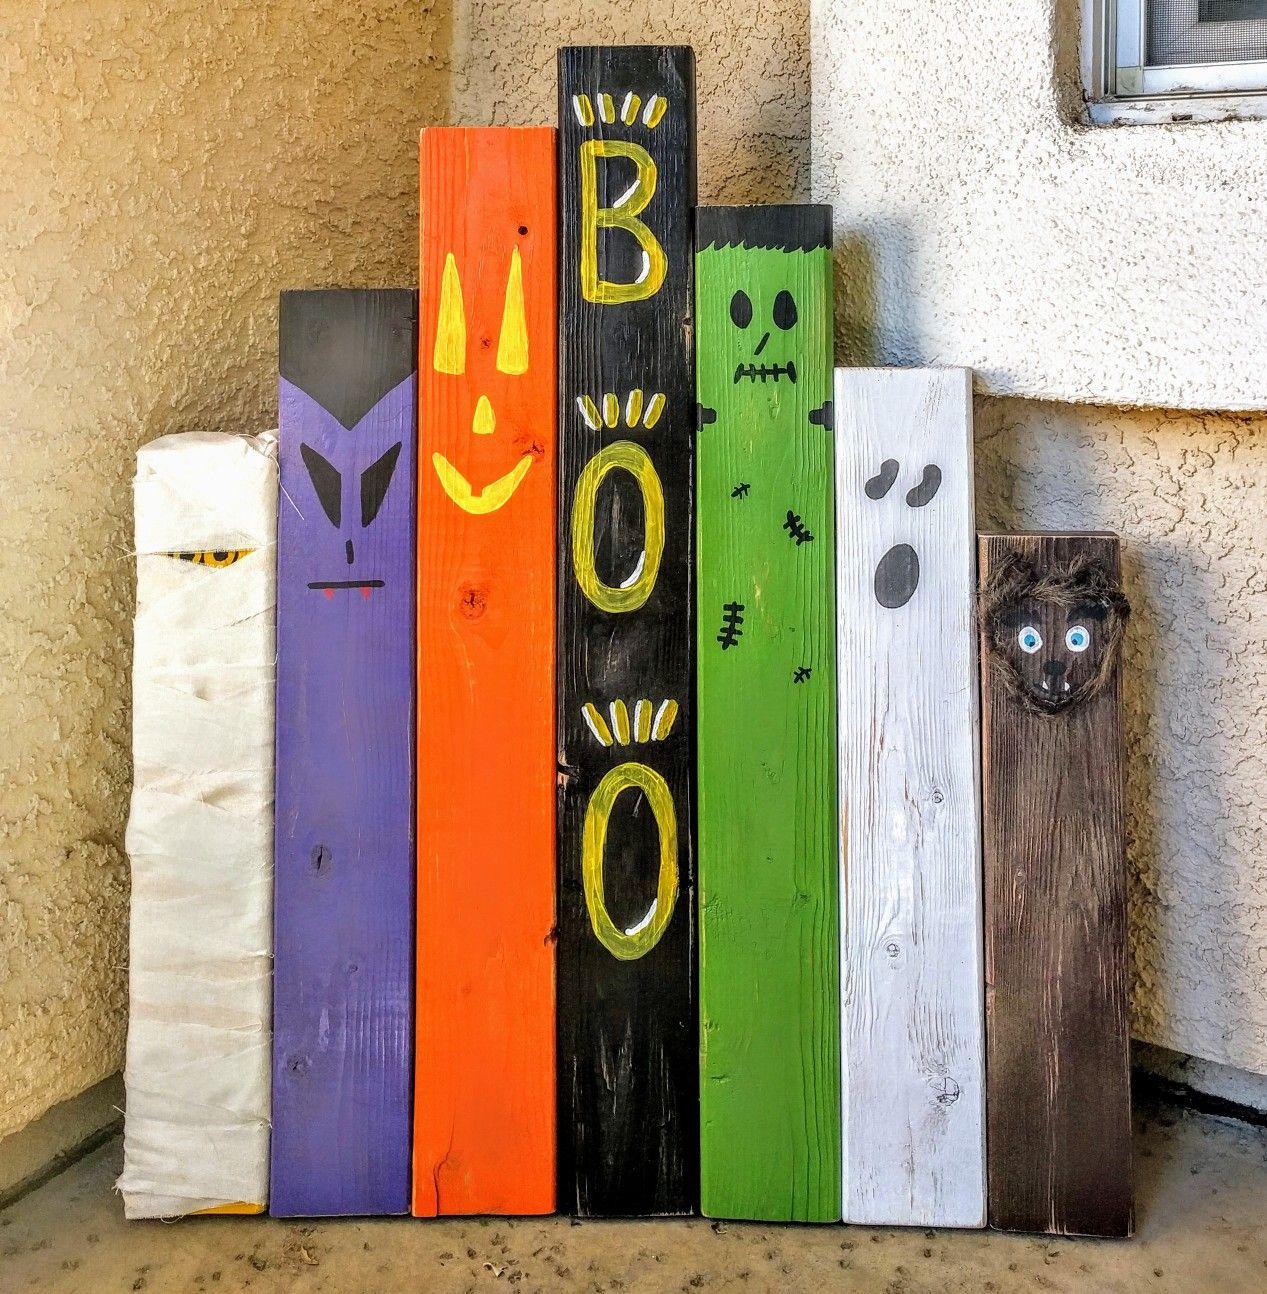 Halloween decor using reclaimed 2x4 wood Craftiness Pinterest - pinterest halloween door decor